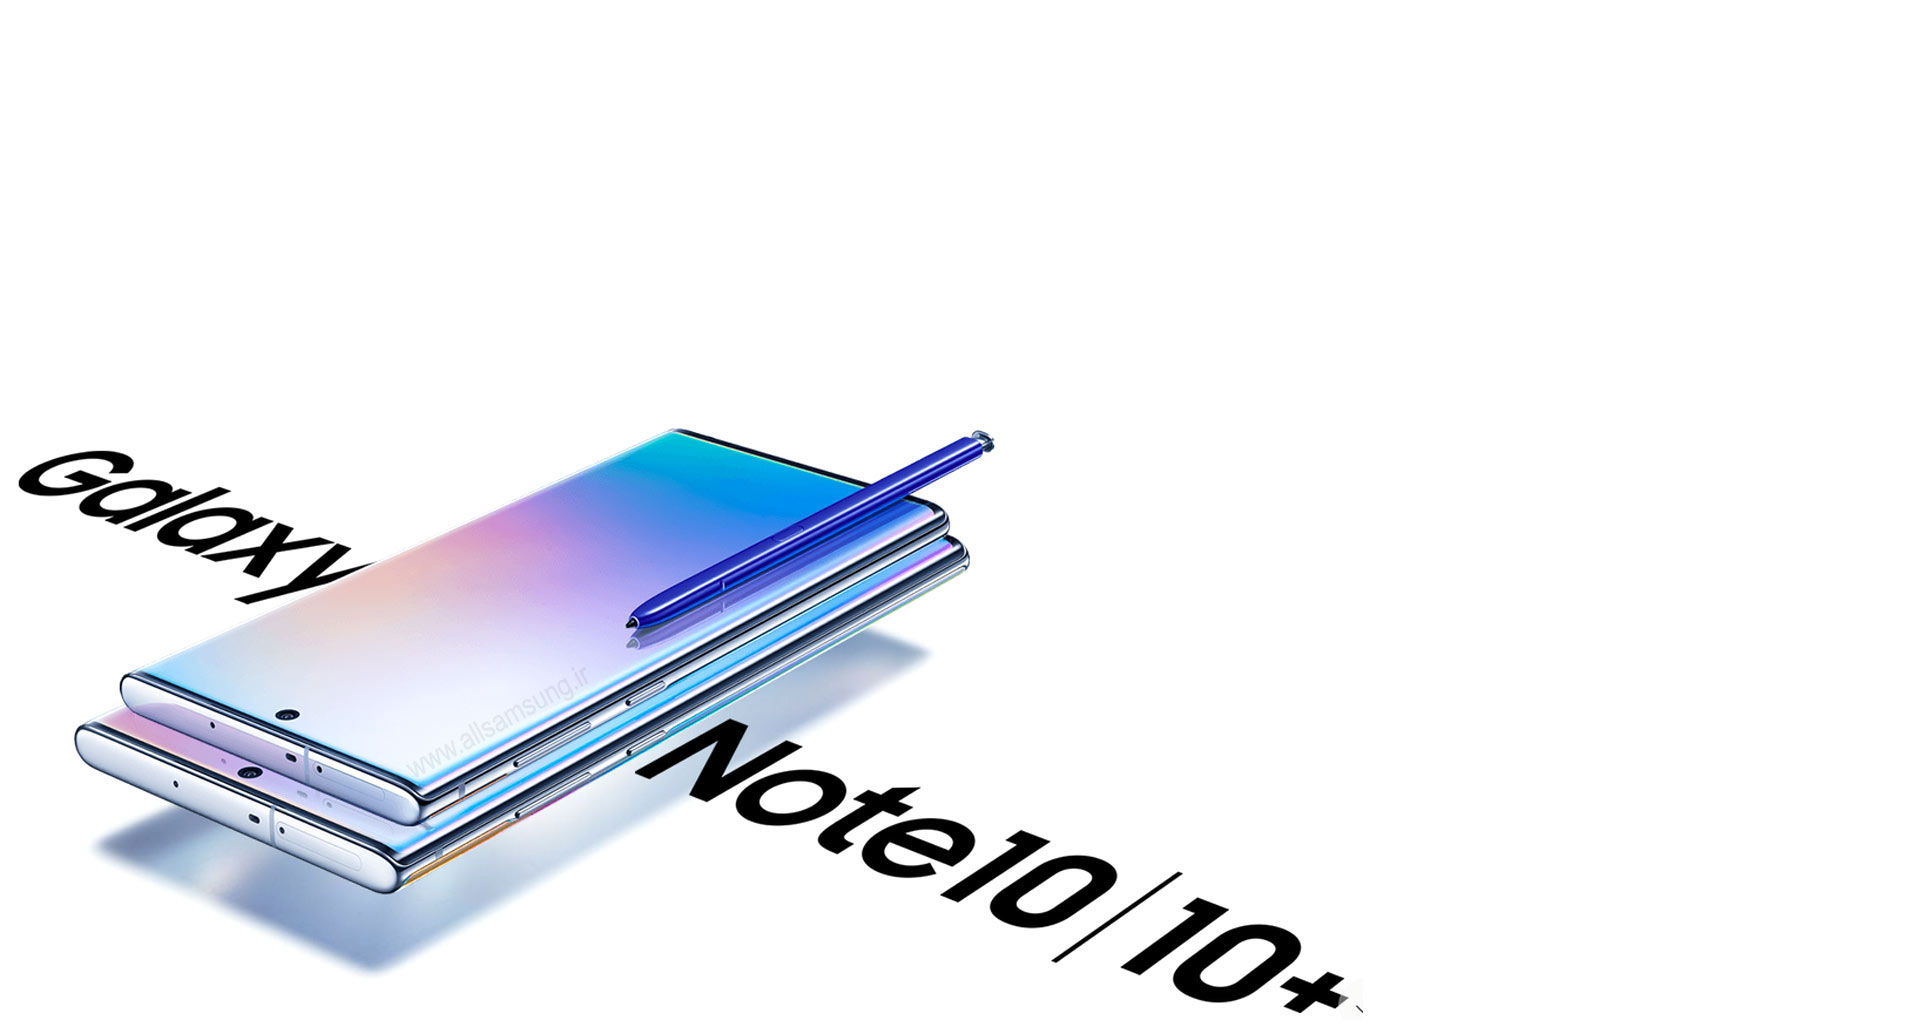 معرفی نسل جدید گوشی پرقدرت سری نوت